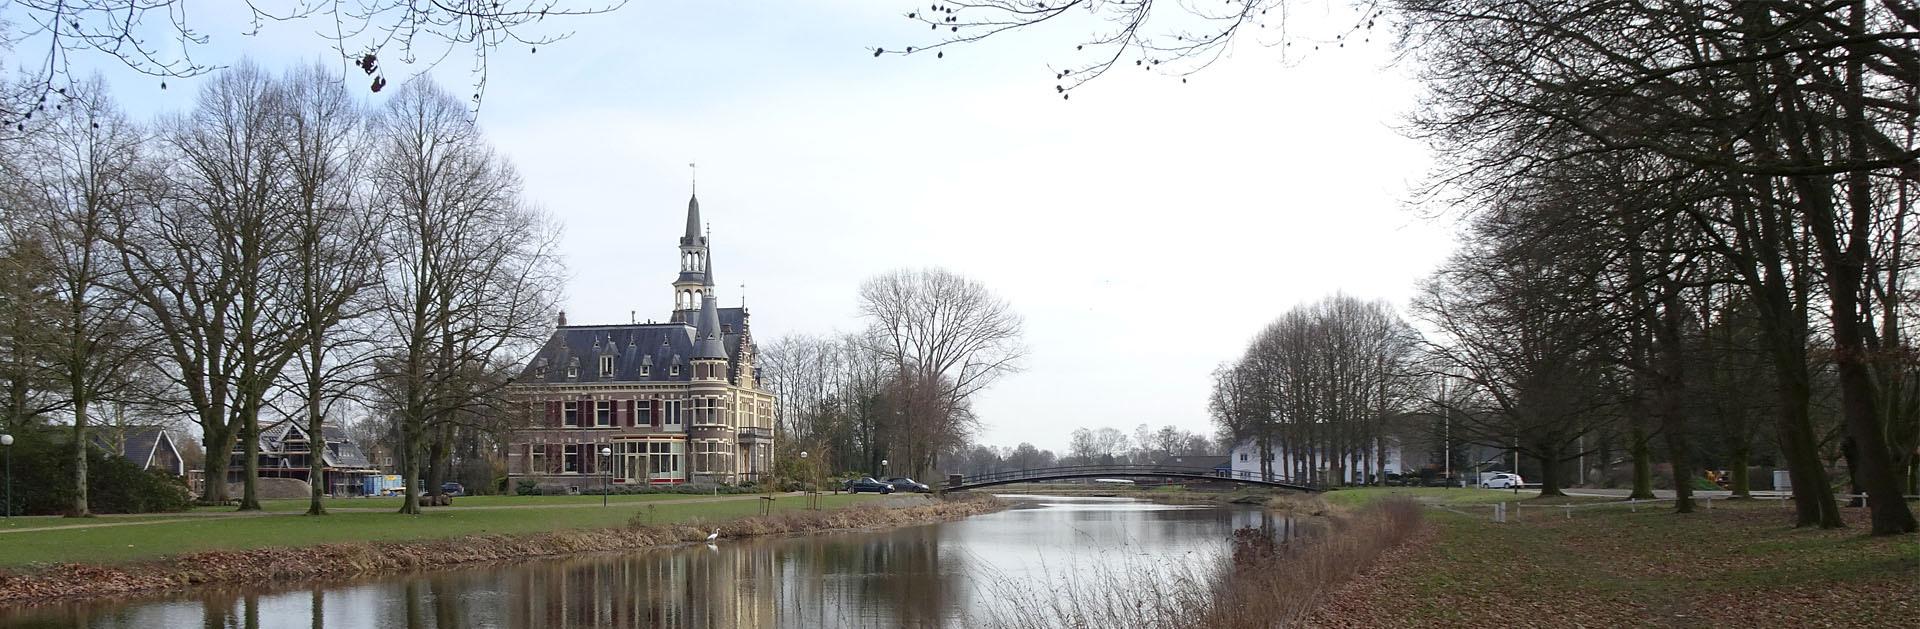 Kasteel de Cloese - Lochem